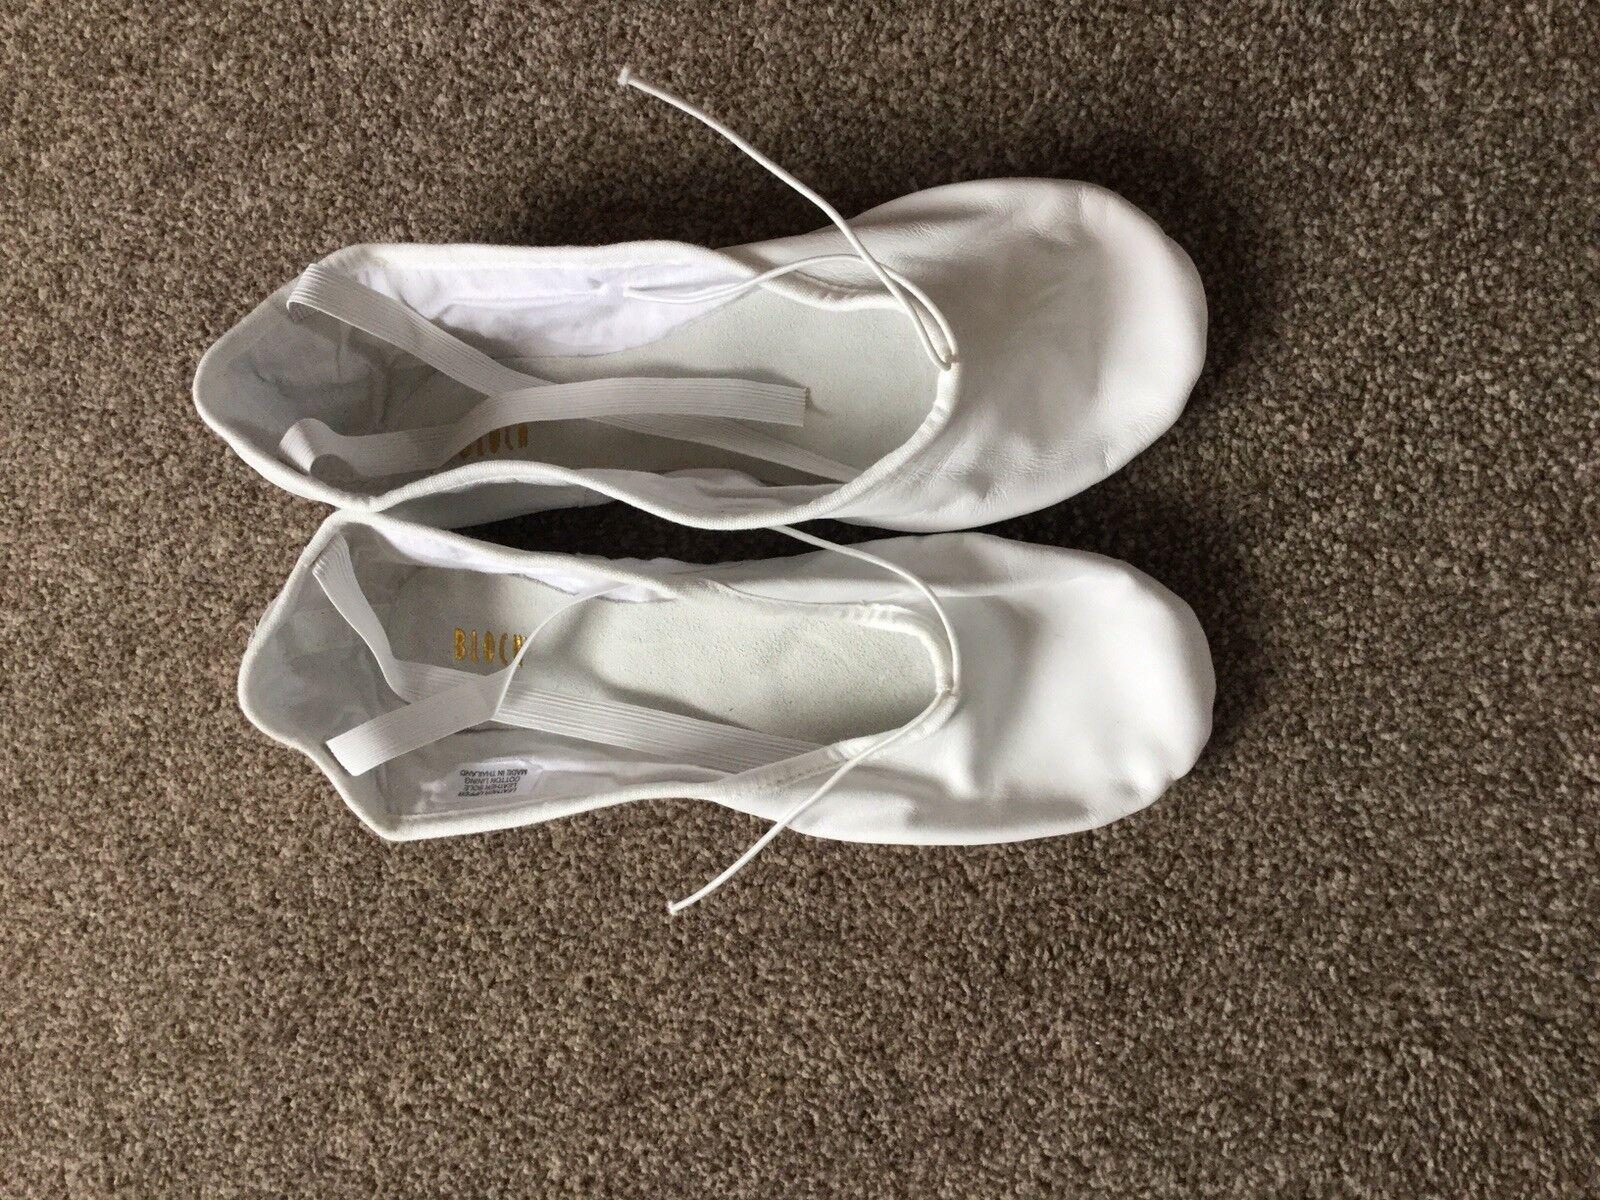 Bloch Split Sole Ballet Shoes White BNIB Size 7.5